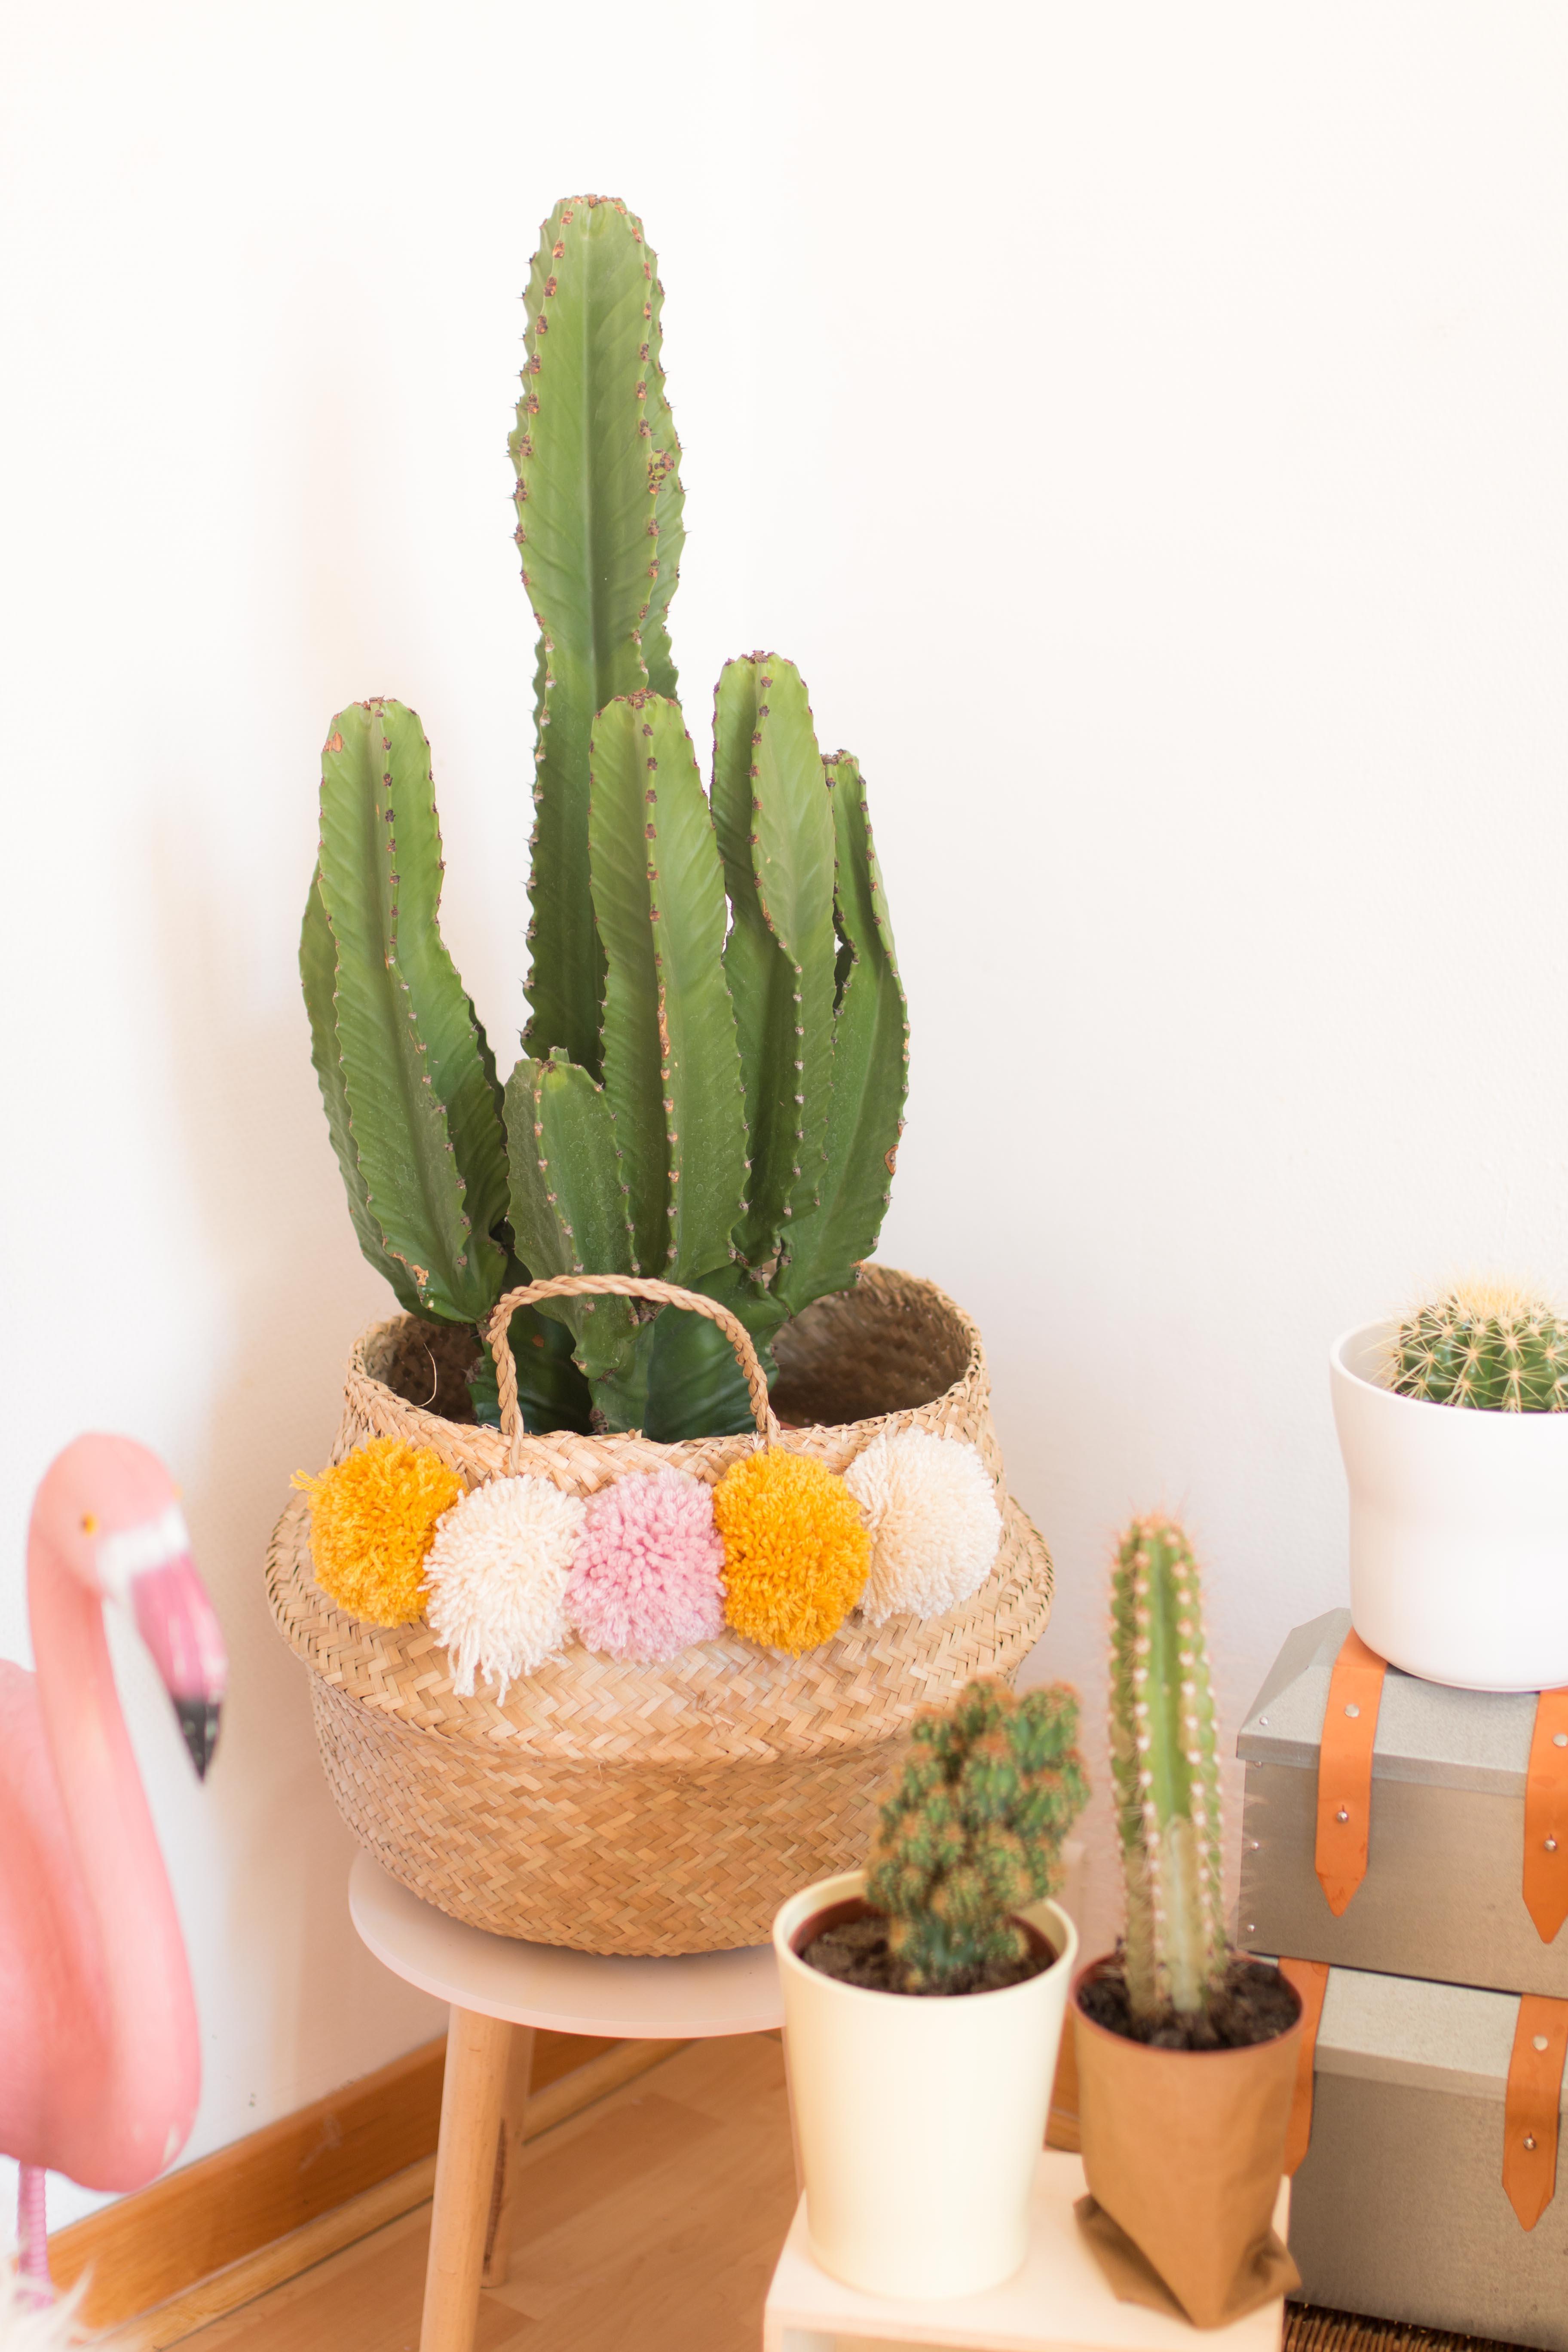 deco-de-mon-salon-home-cute-sweet-home-i-sp4nkblog-4